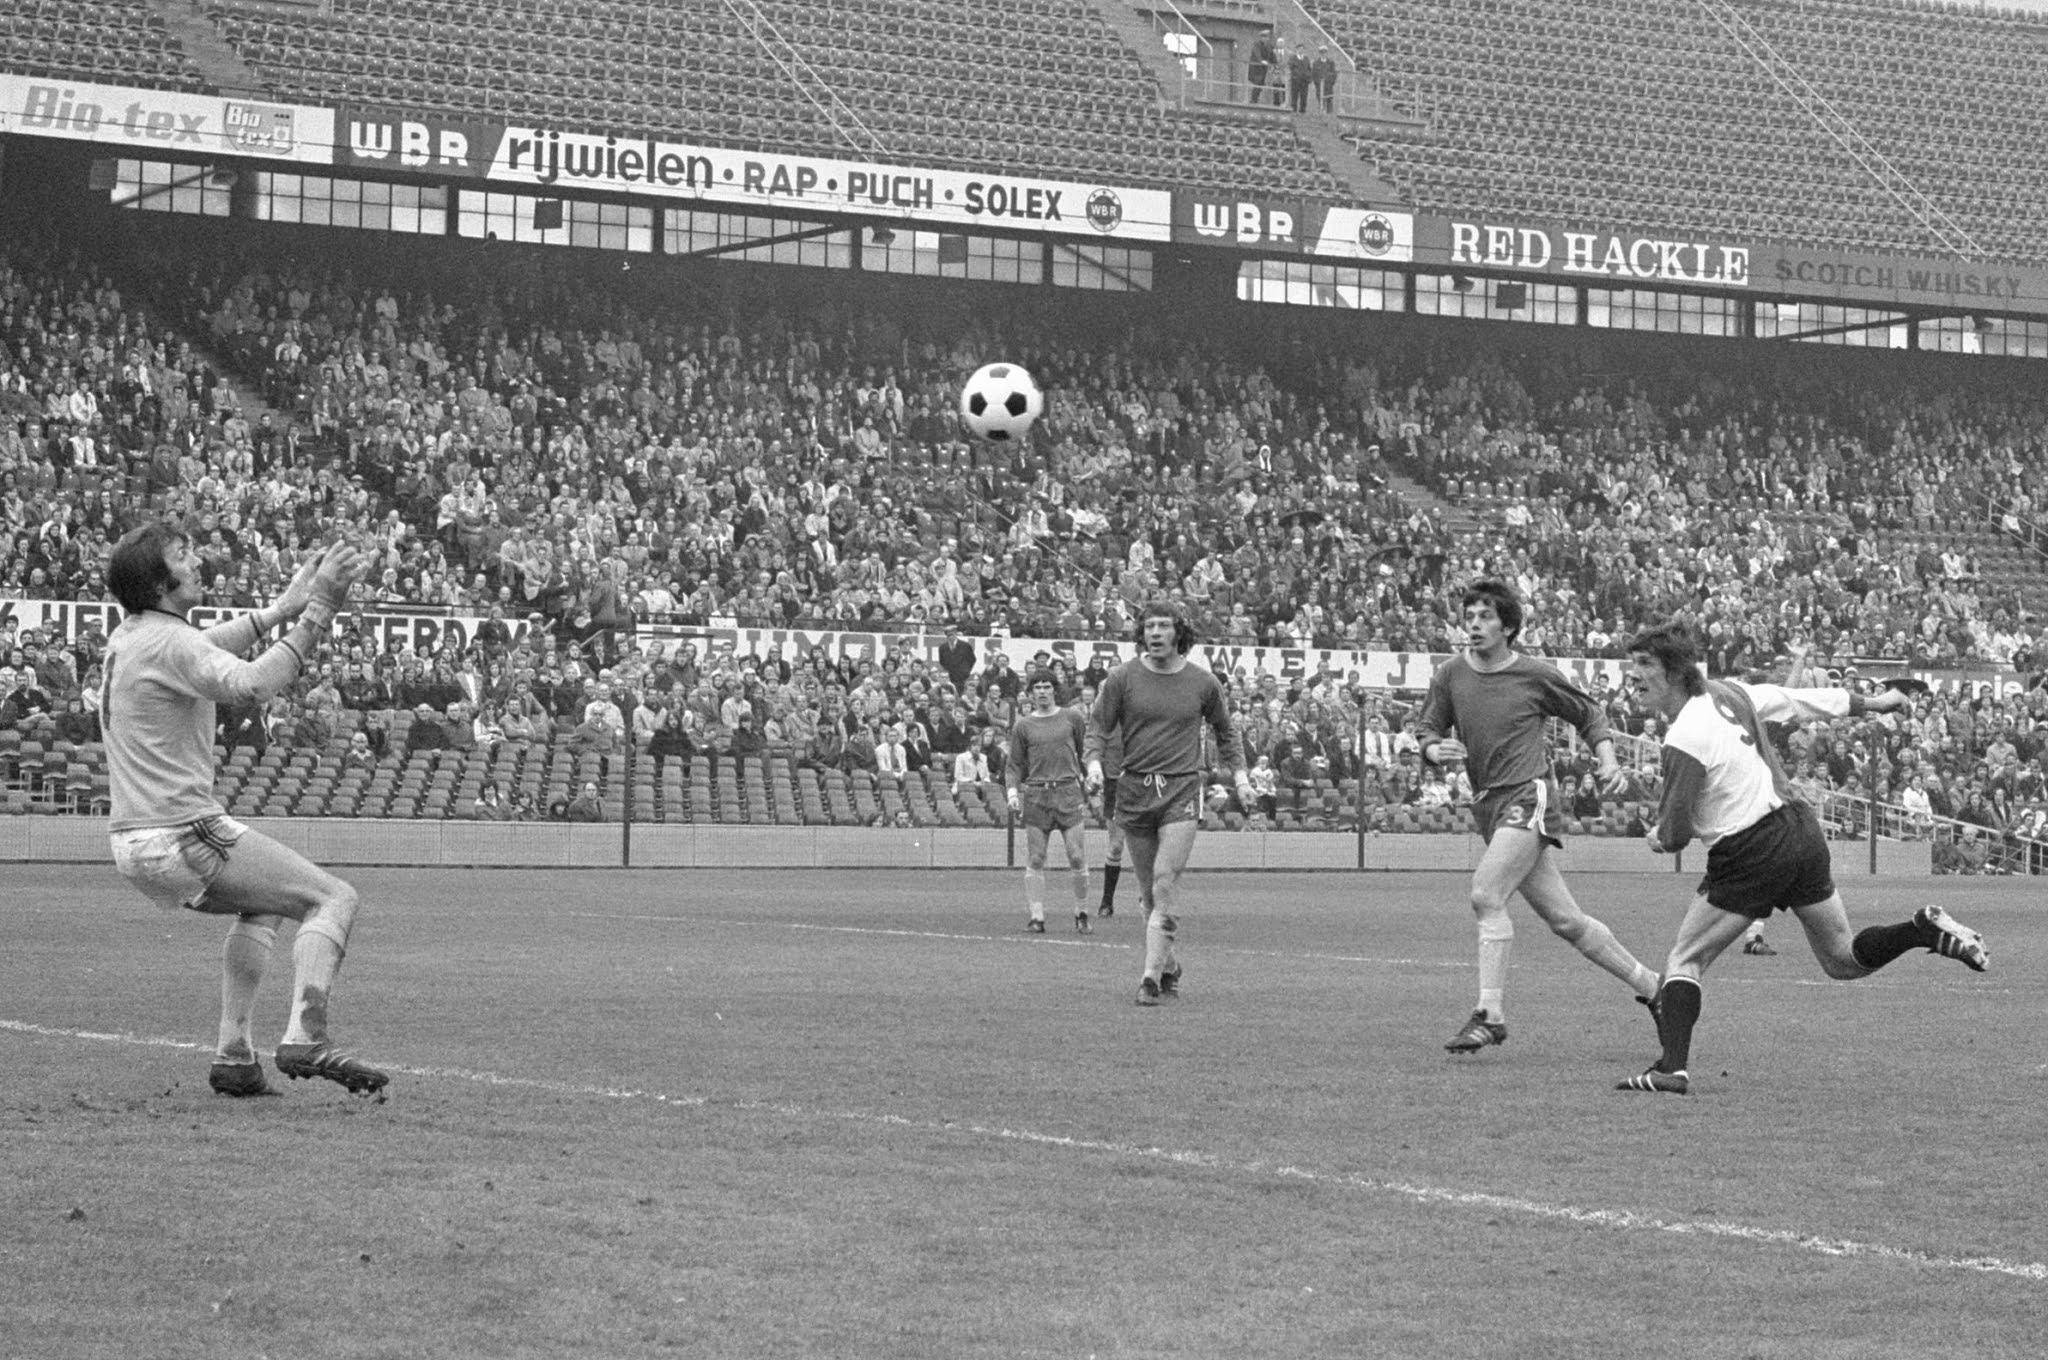 Attila Ladinsky scoort het openingsdoelpunt namens Feyenoord